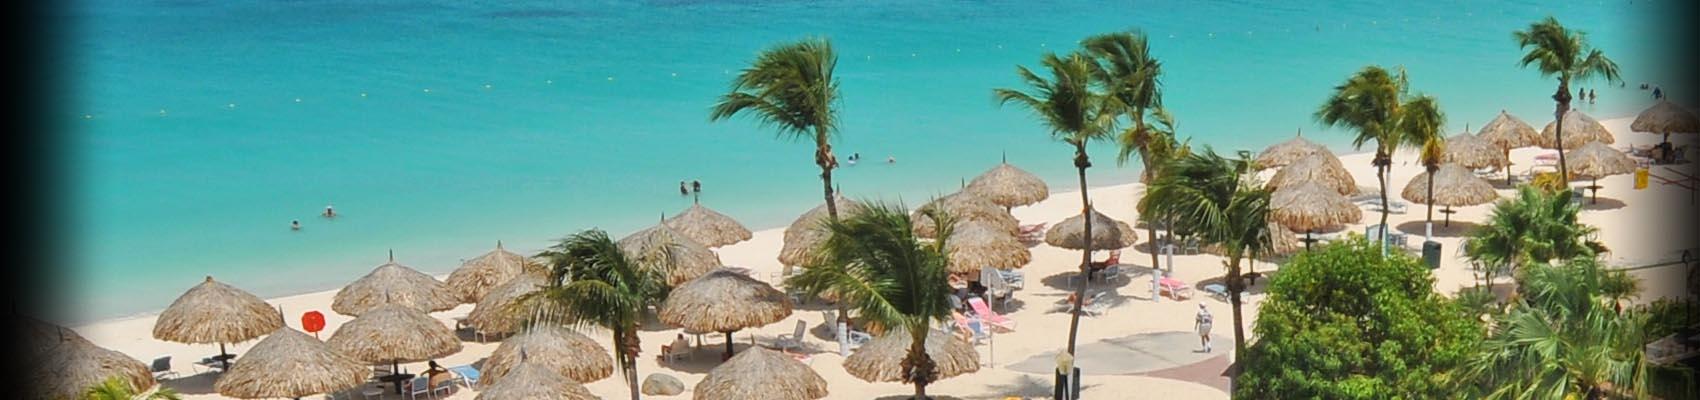 Costa Linda Aruba Car Rental